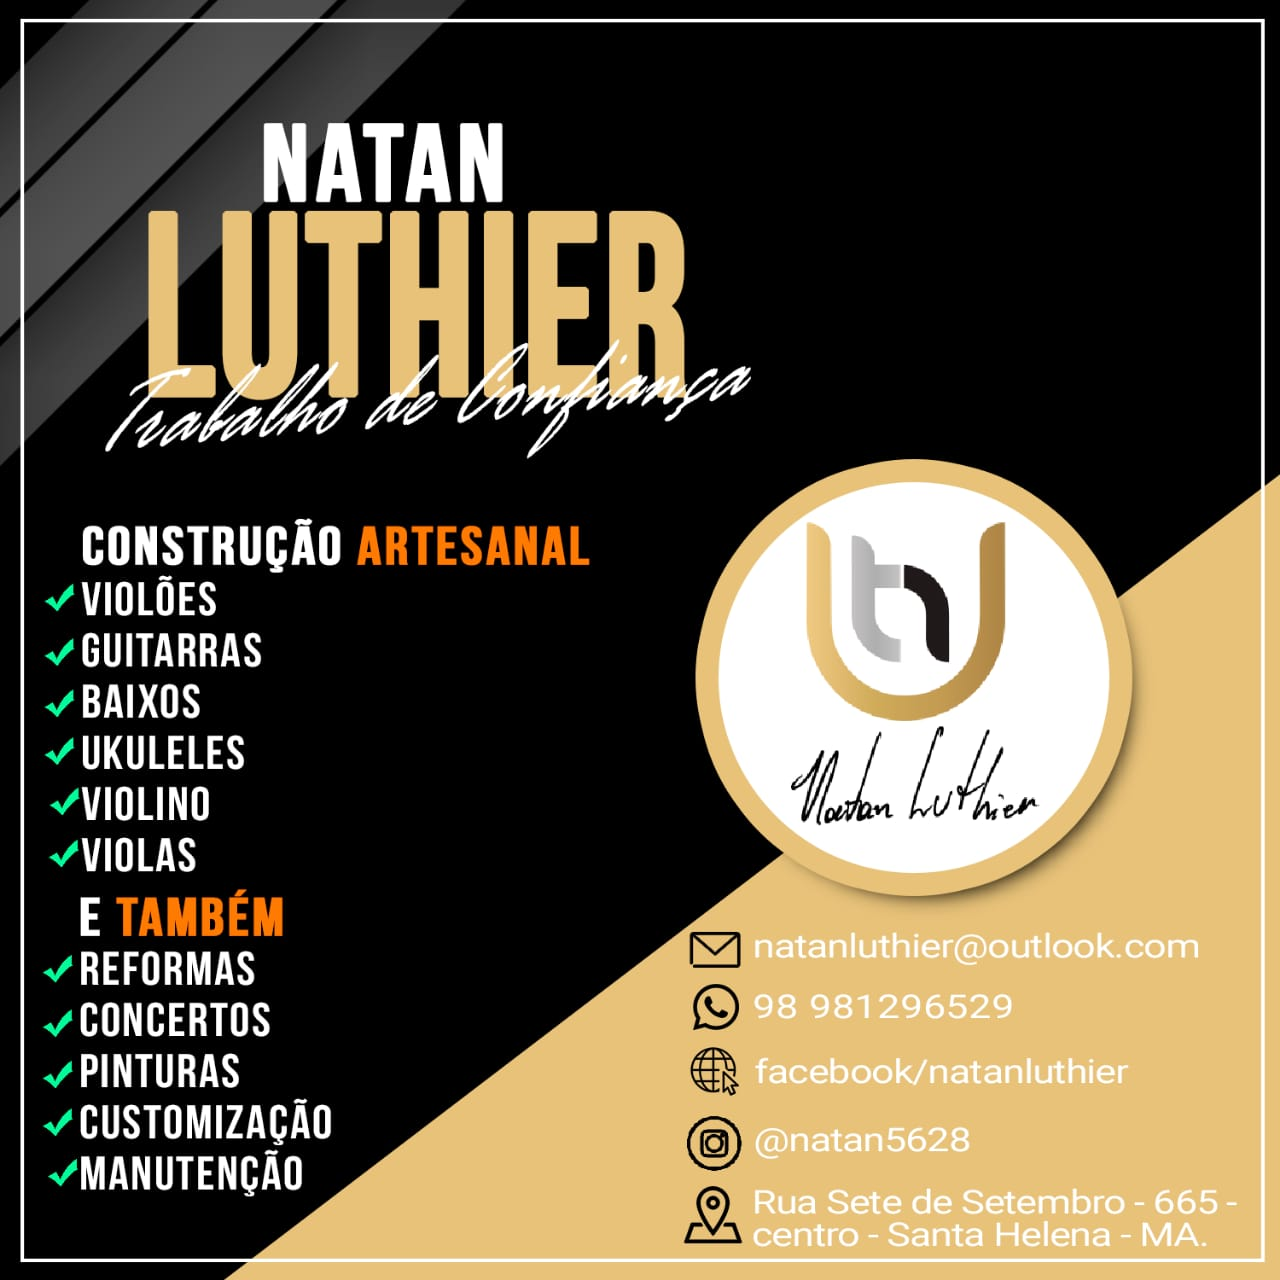 NATAN LUTHIER